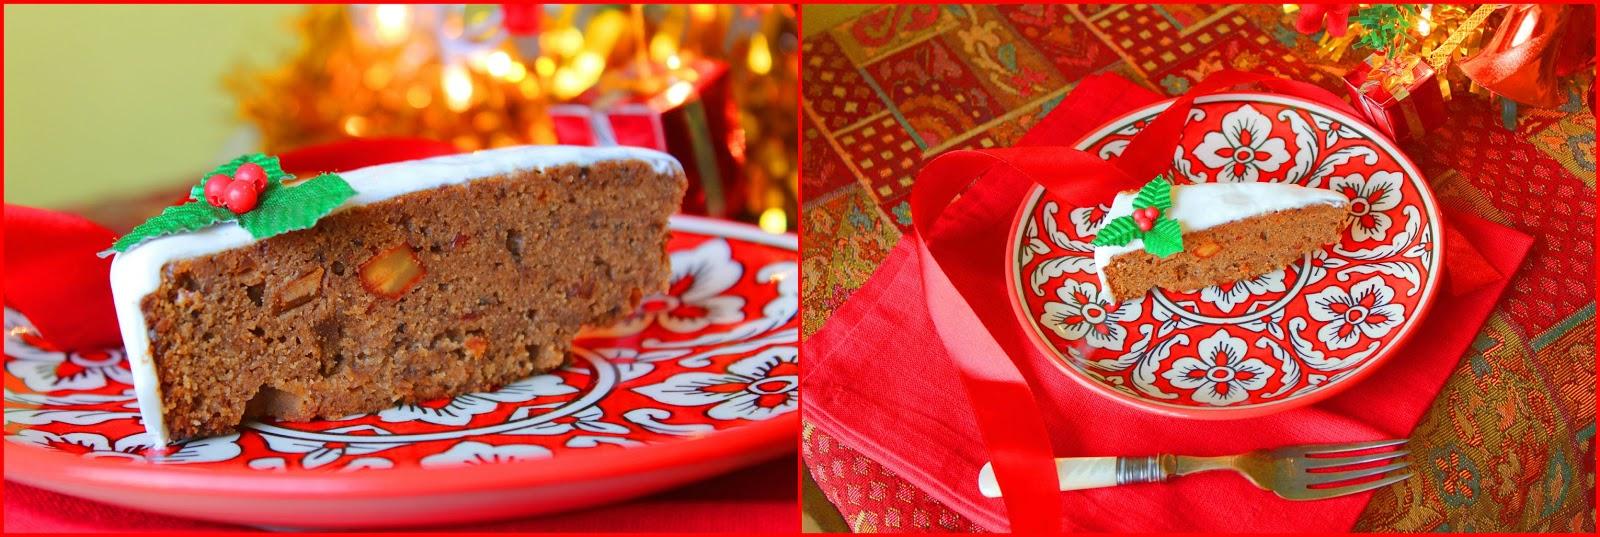 A Dollop of That!: Christmas Cake - Fruit Cake - Rum Cake - Plum Cake